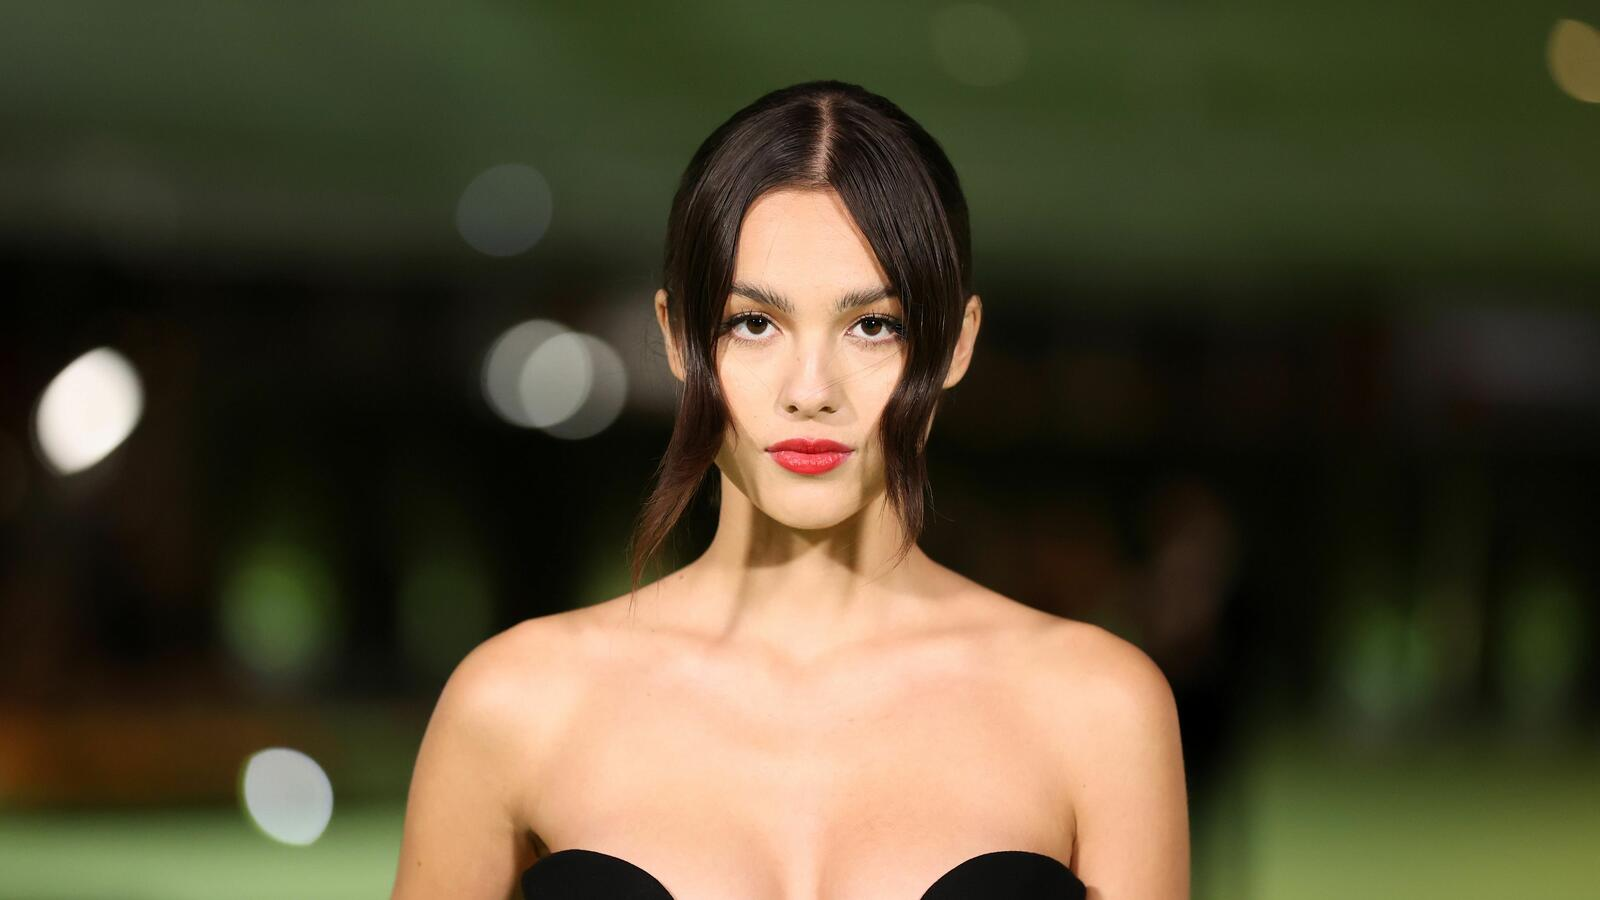 Olivia Rodrigo Shares What Trait She's Most Proud Of